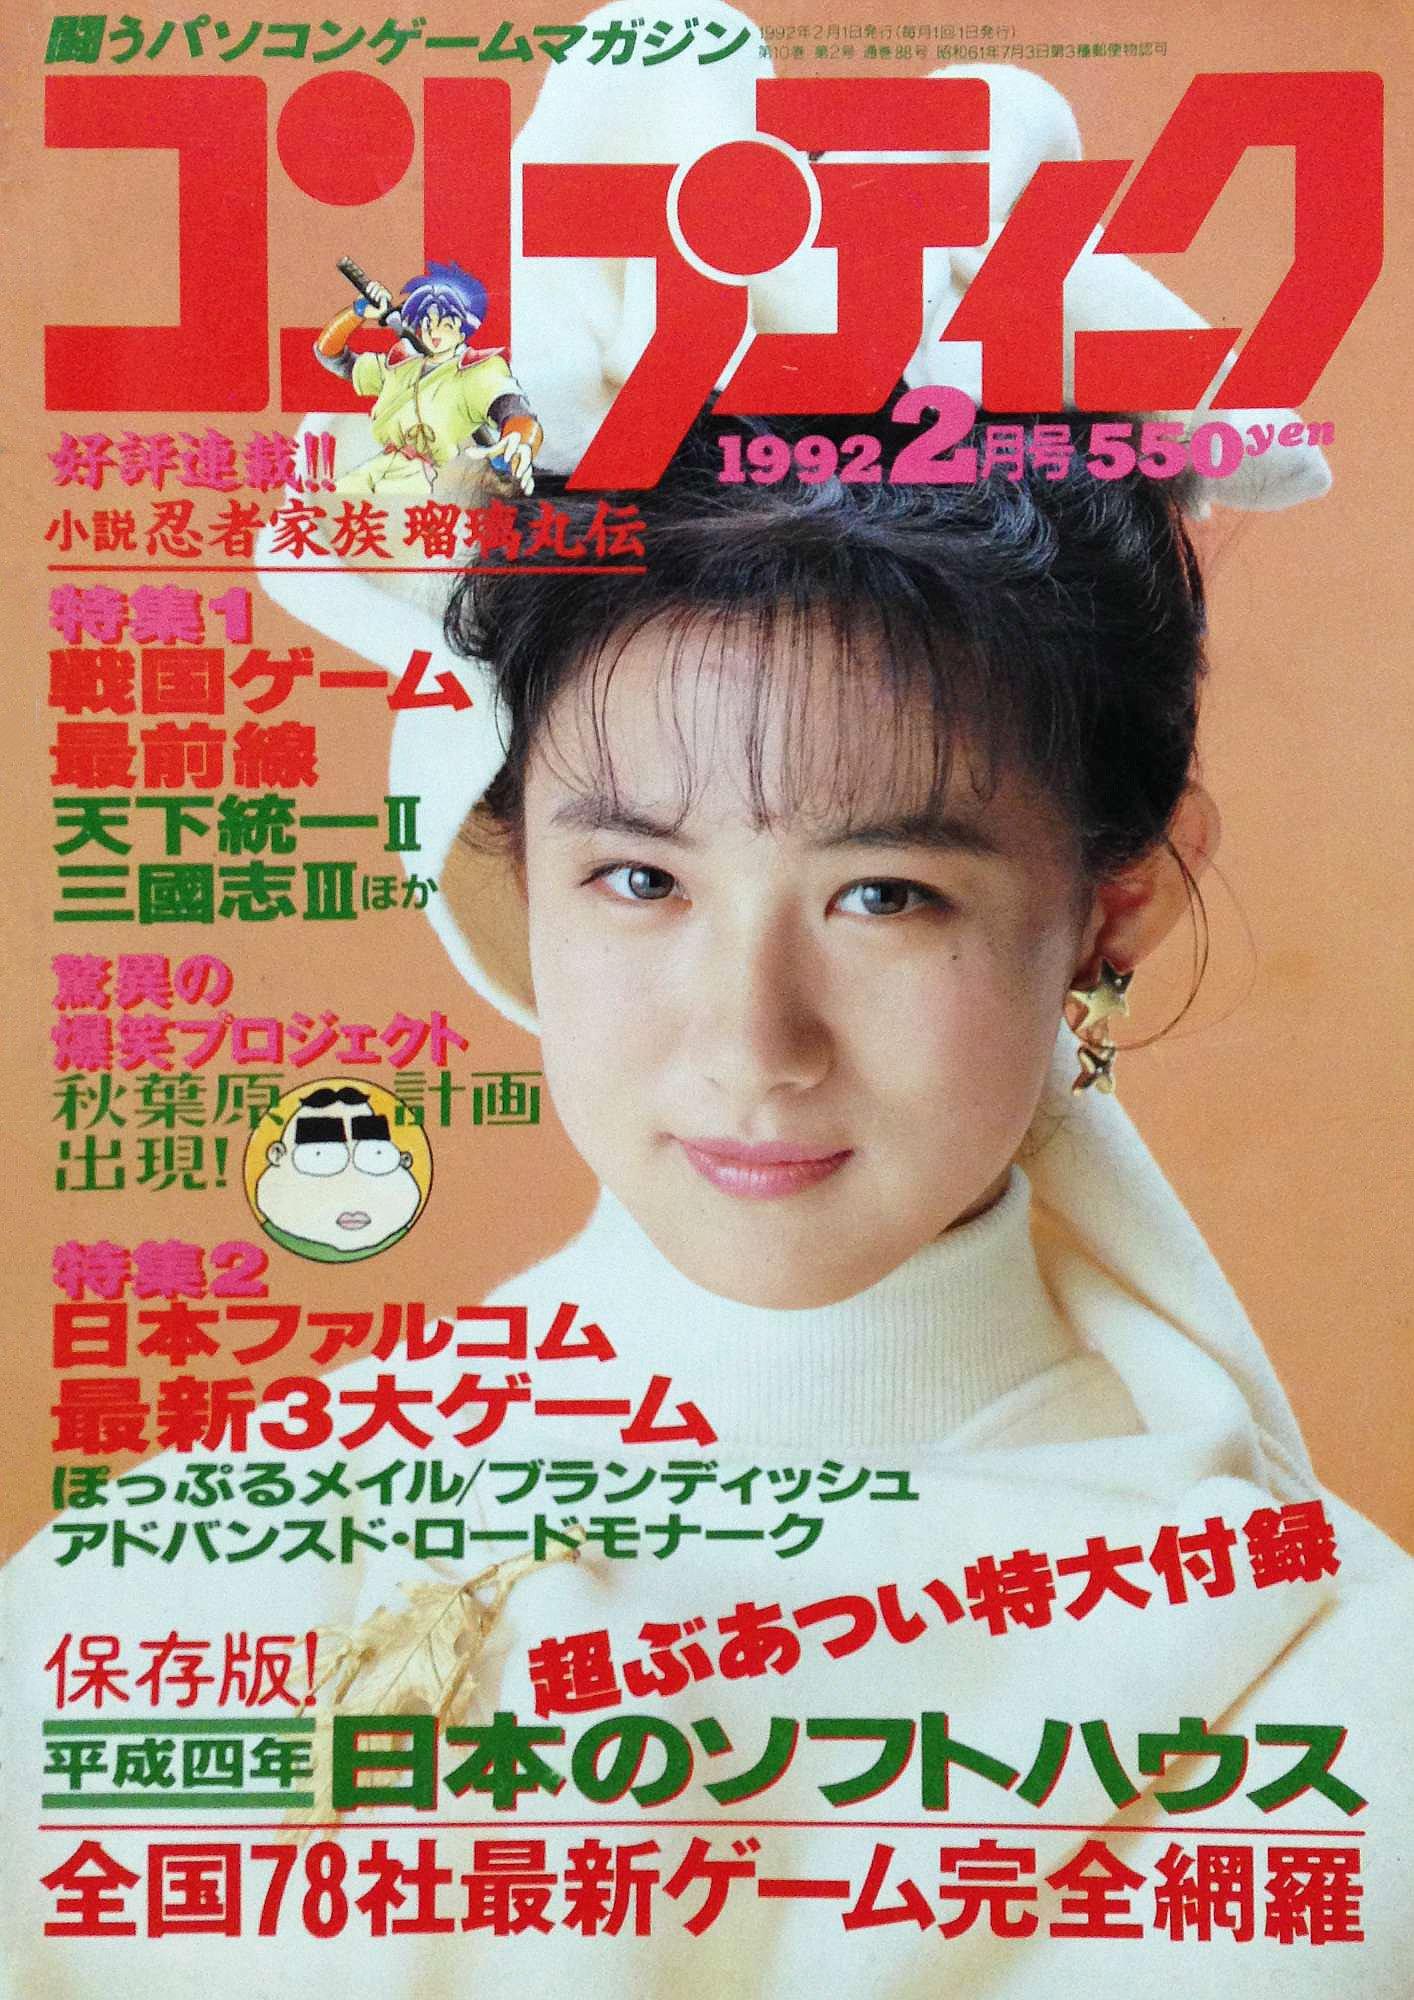 Comptiq Issue 088 (February 1992)